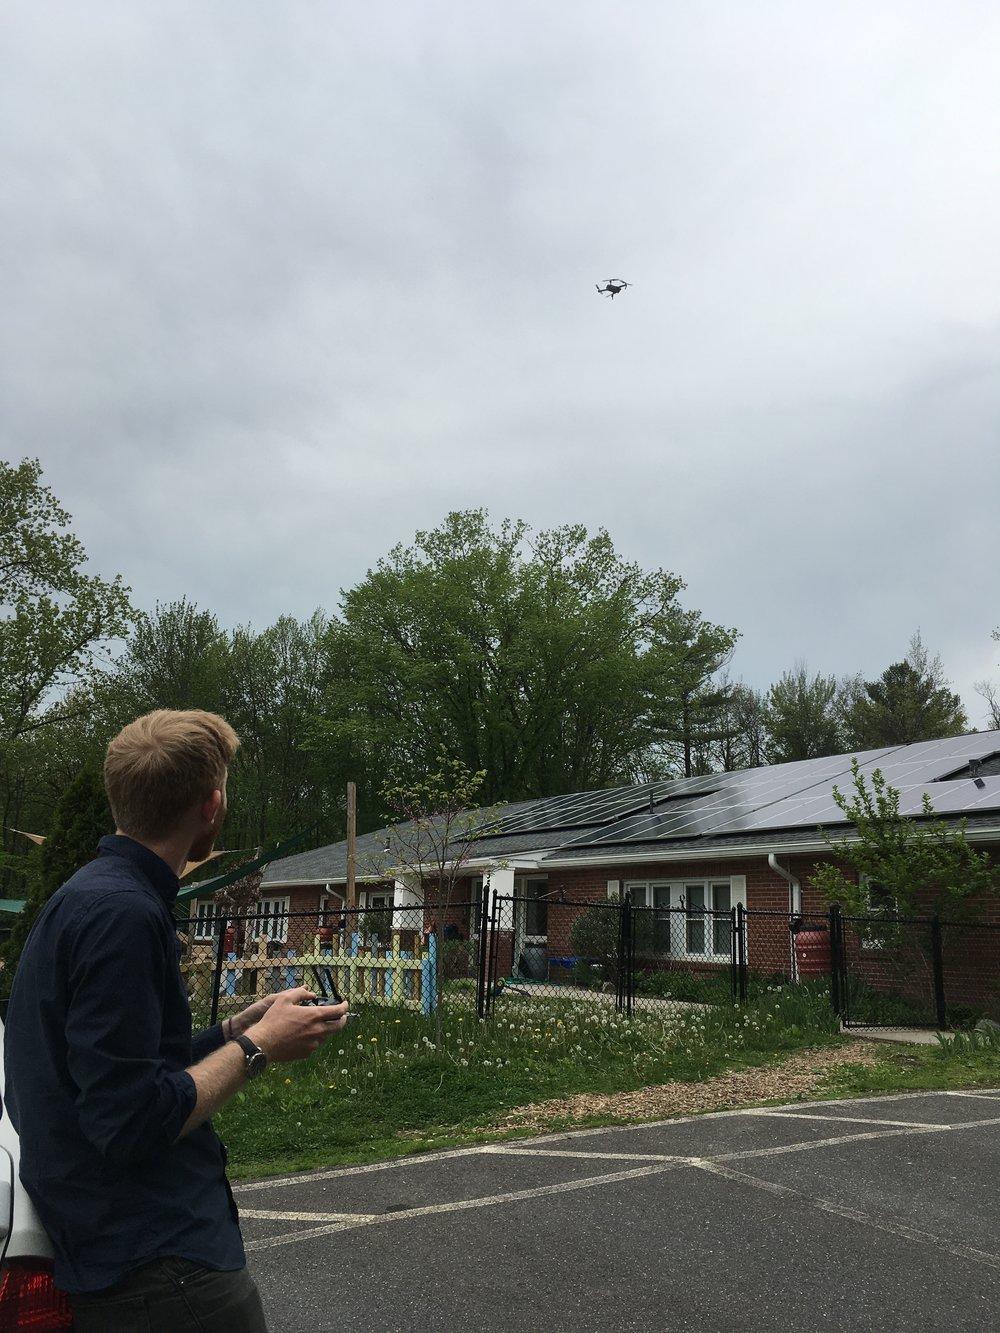 Sunnyside Solar IB with drone.jpg